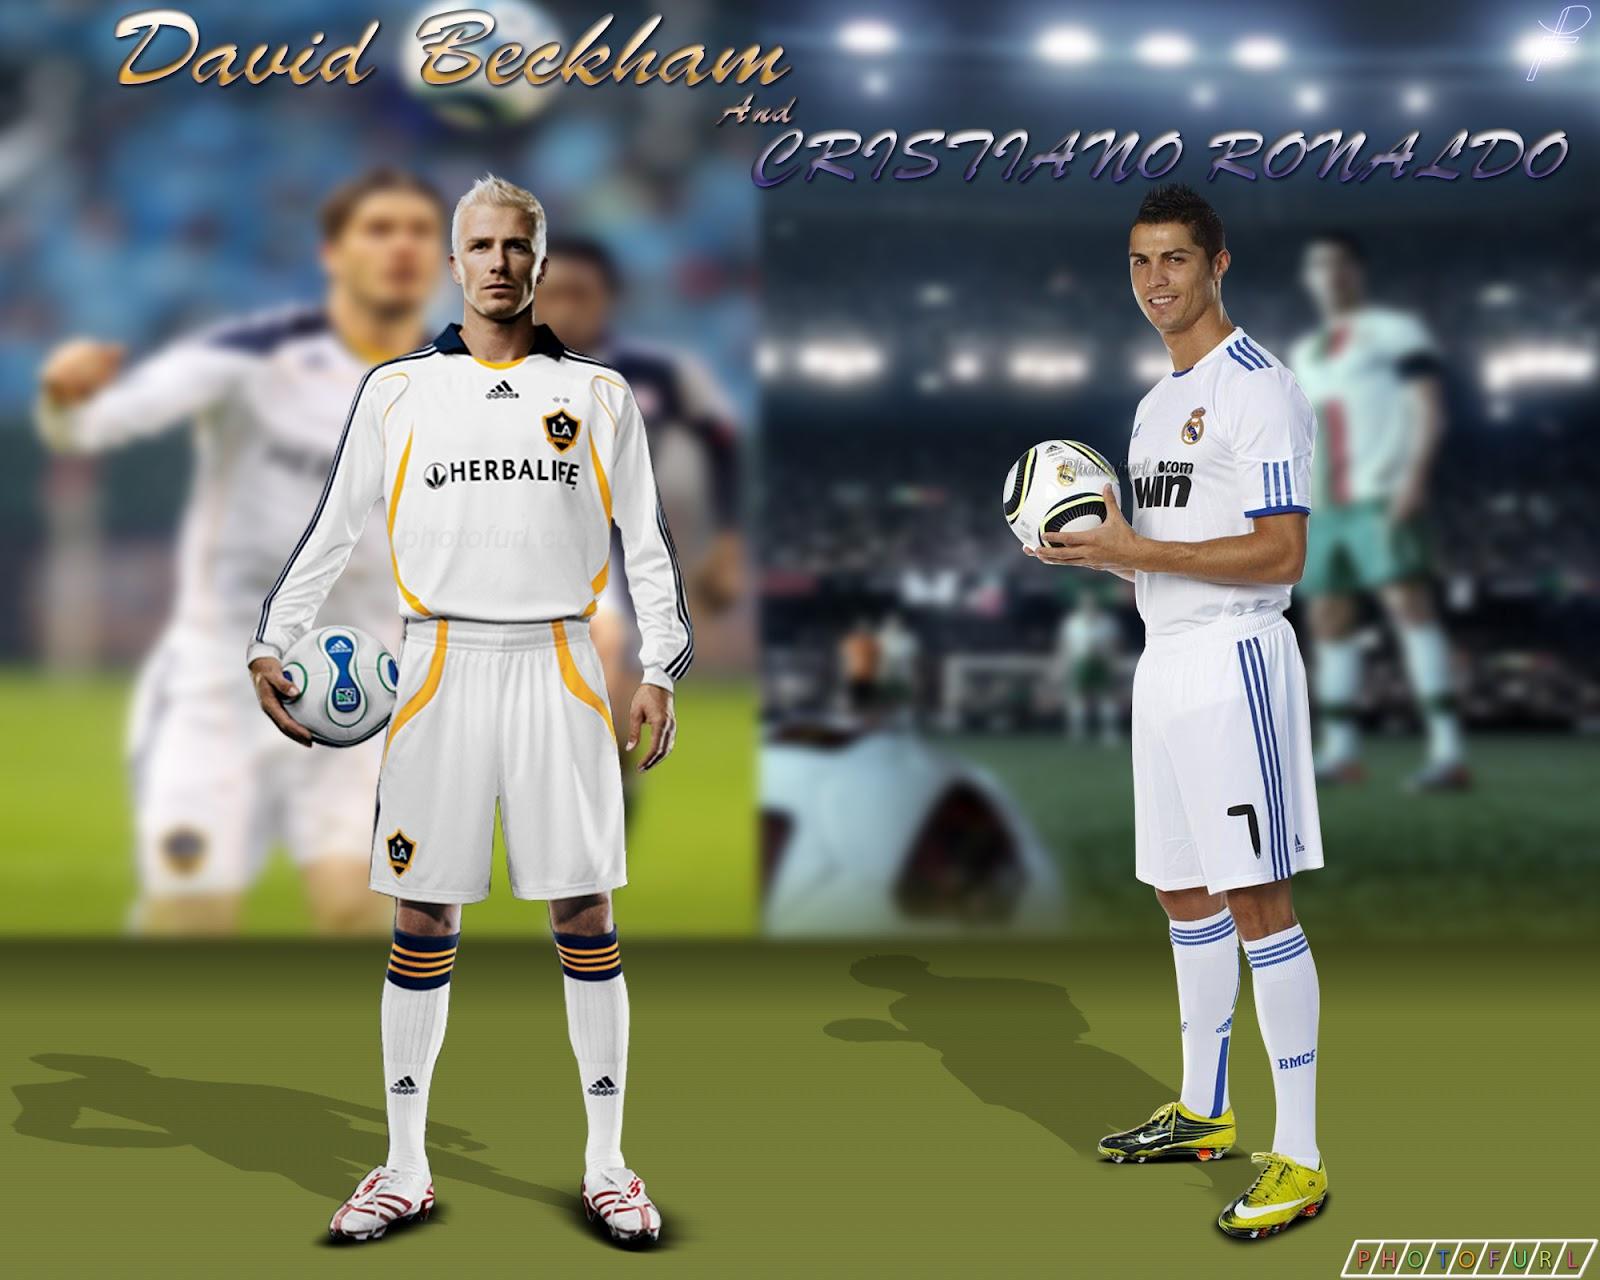 Hd Desktop Wallpaper For Football Lovers 9: Football Lovers: Football Wallpapers Hd